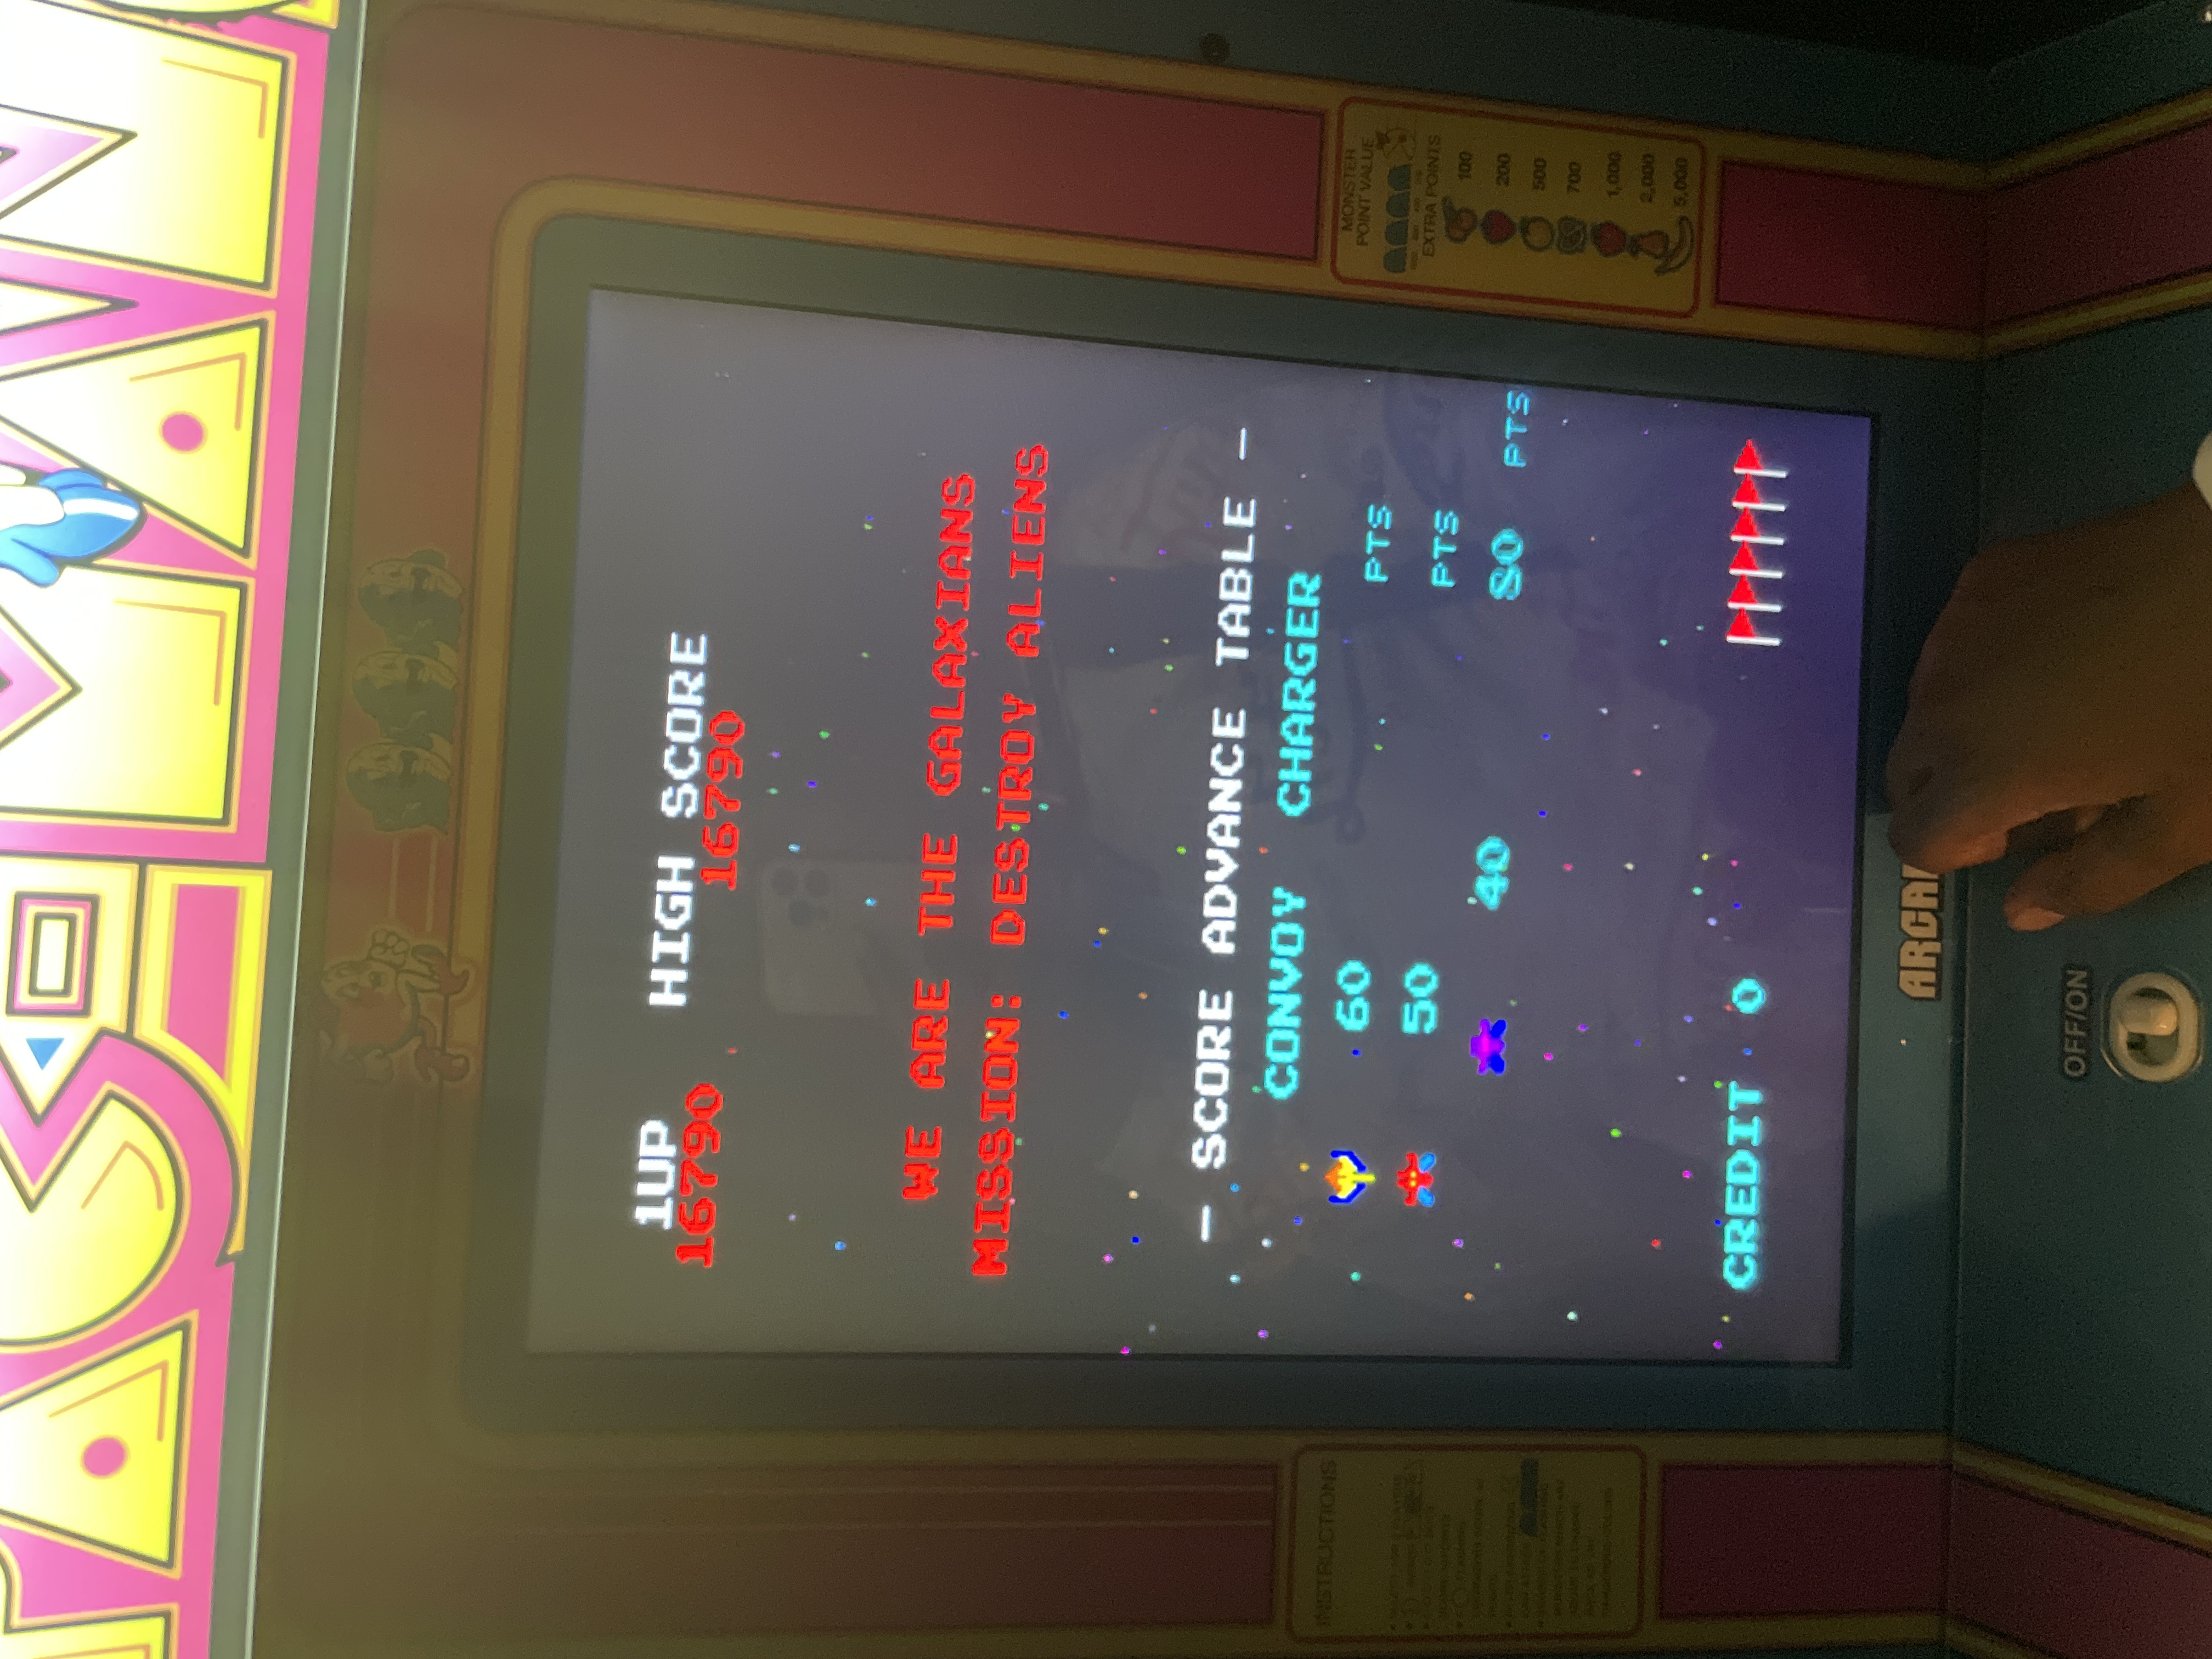 yayaludd: Galaxian Part 4 [galap4] (Arcade Emulated / M.A.M.E.) 16,790 points on 2021-04-05 21:06:47